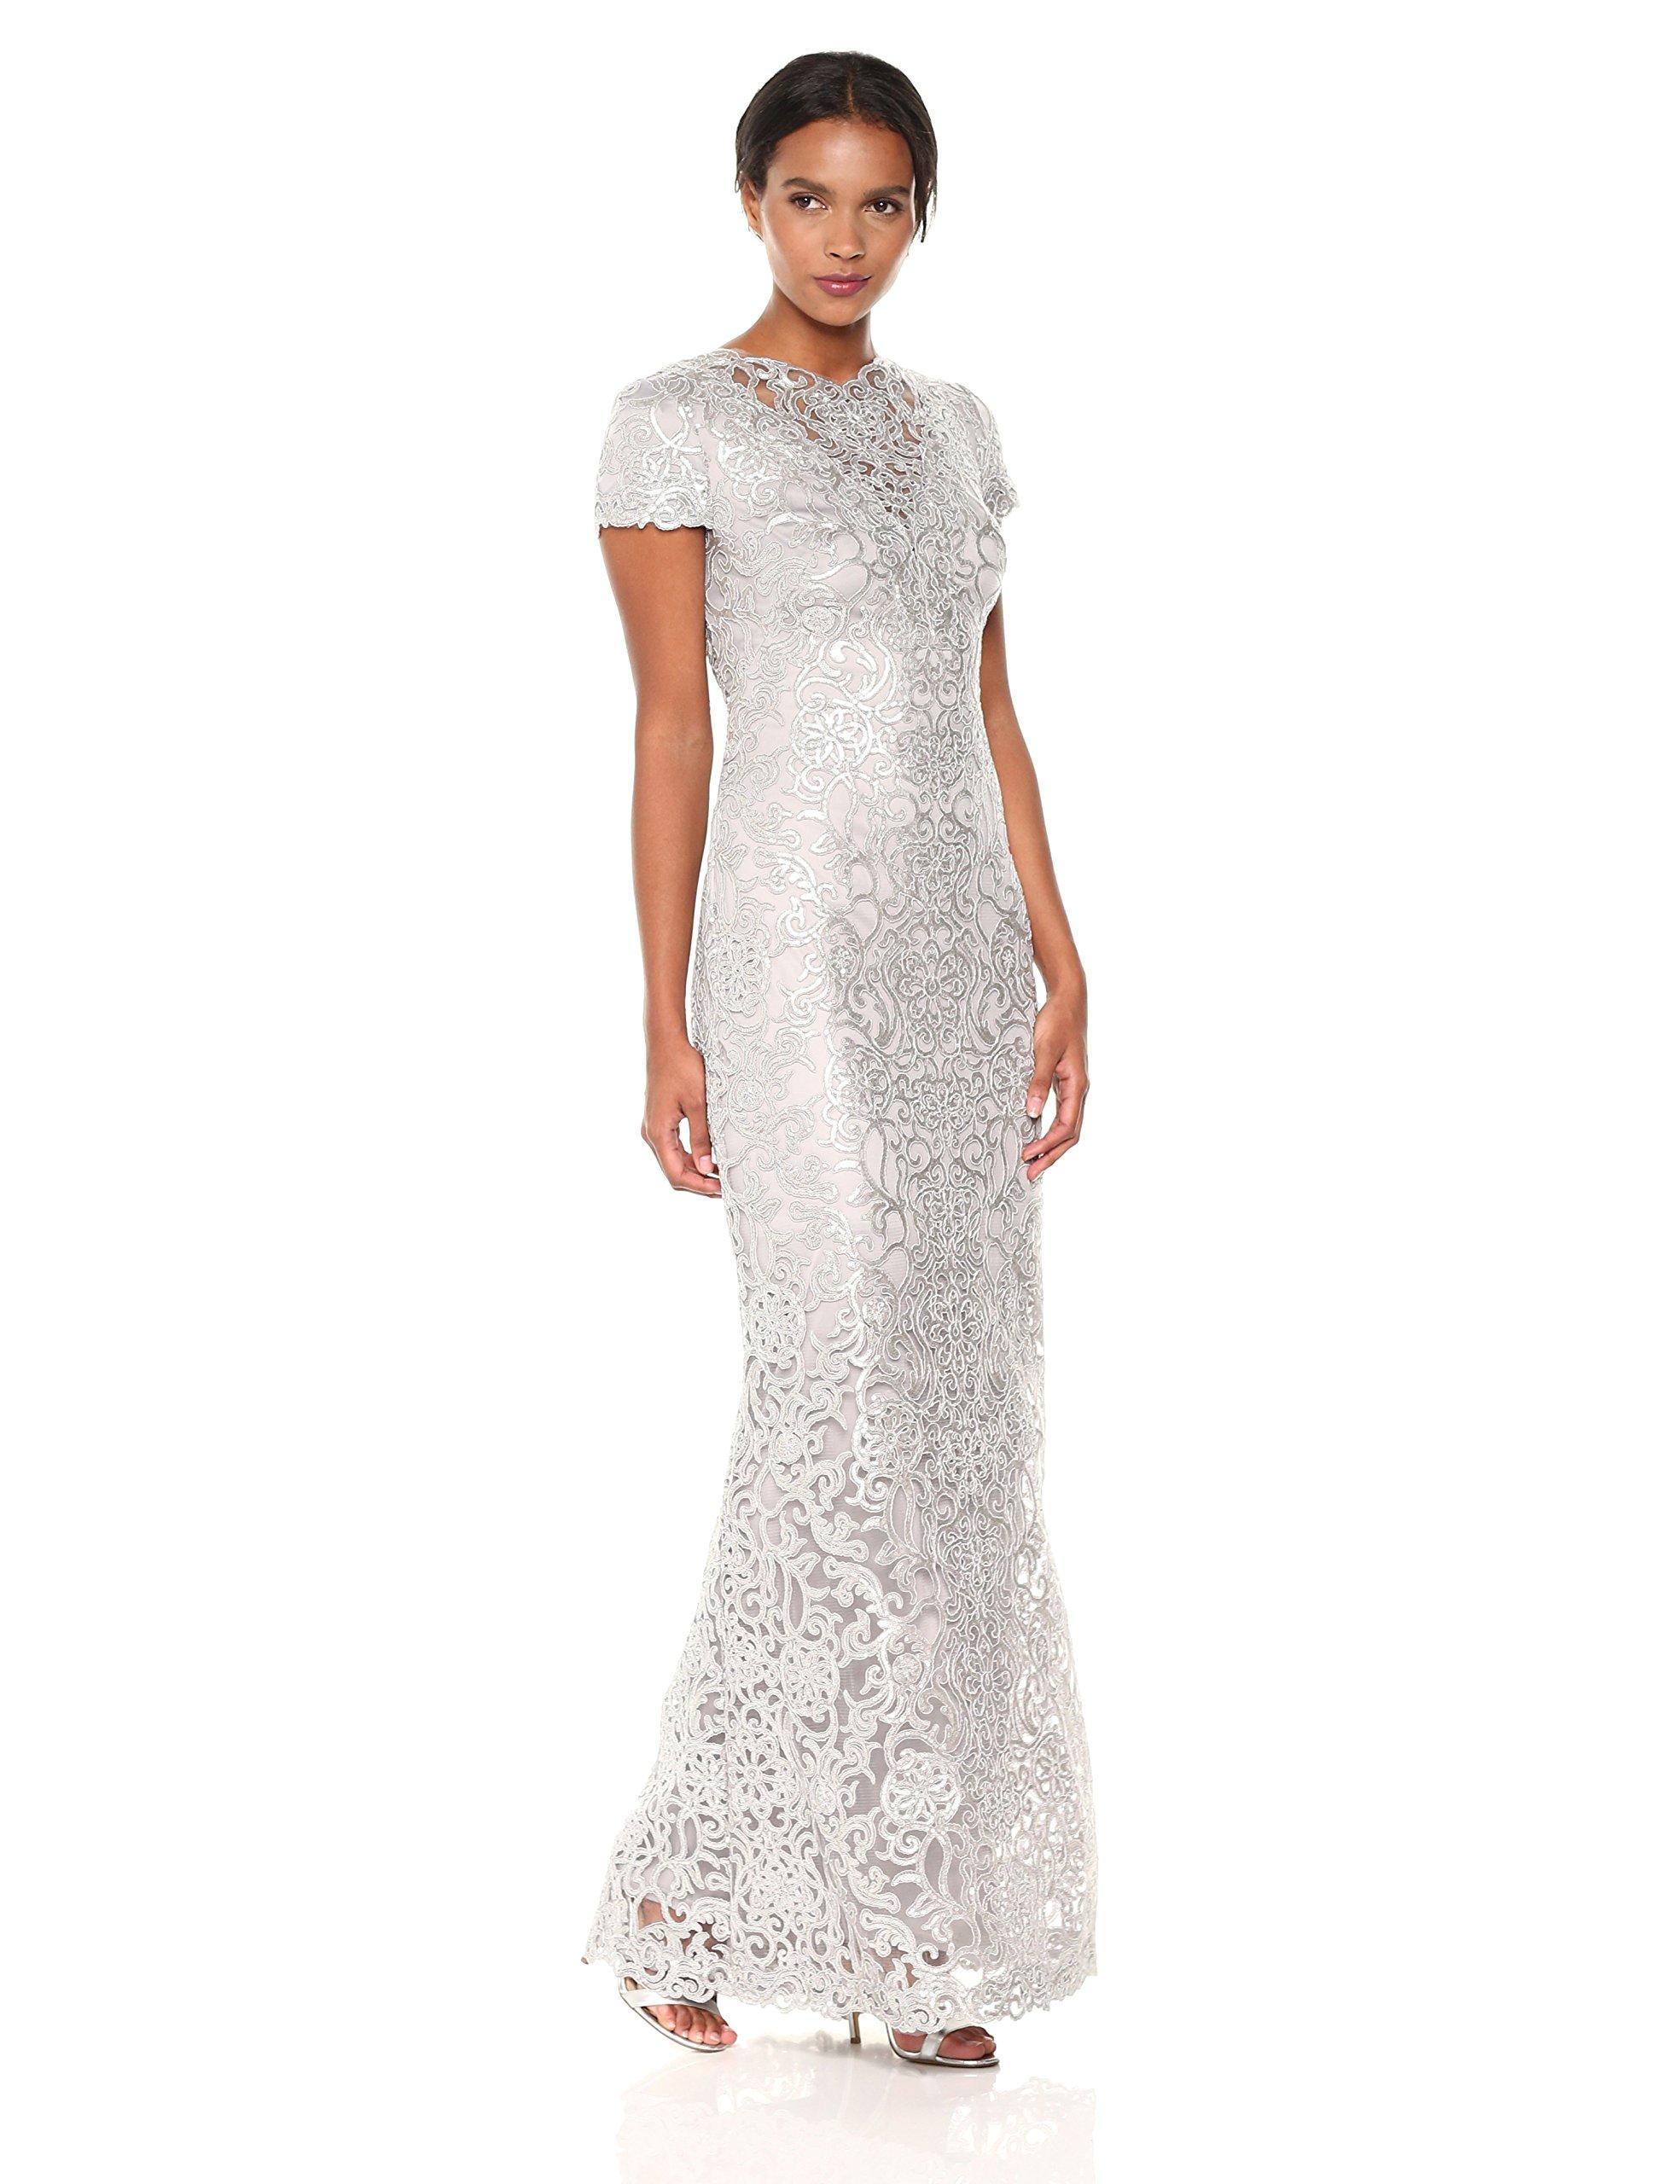 651adbb6b71aa Tadashi Shoji Wedding Dresses collection - Modern design and styles